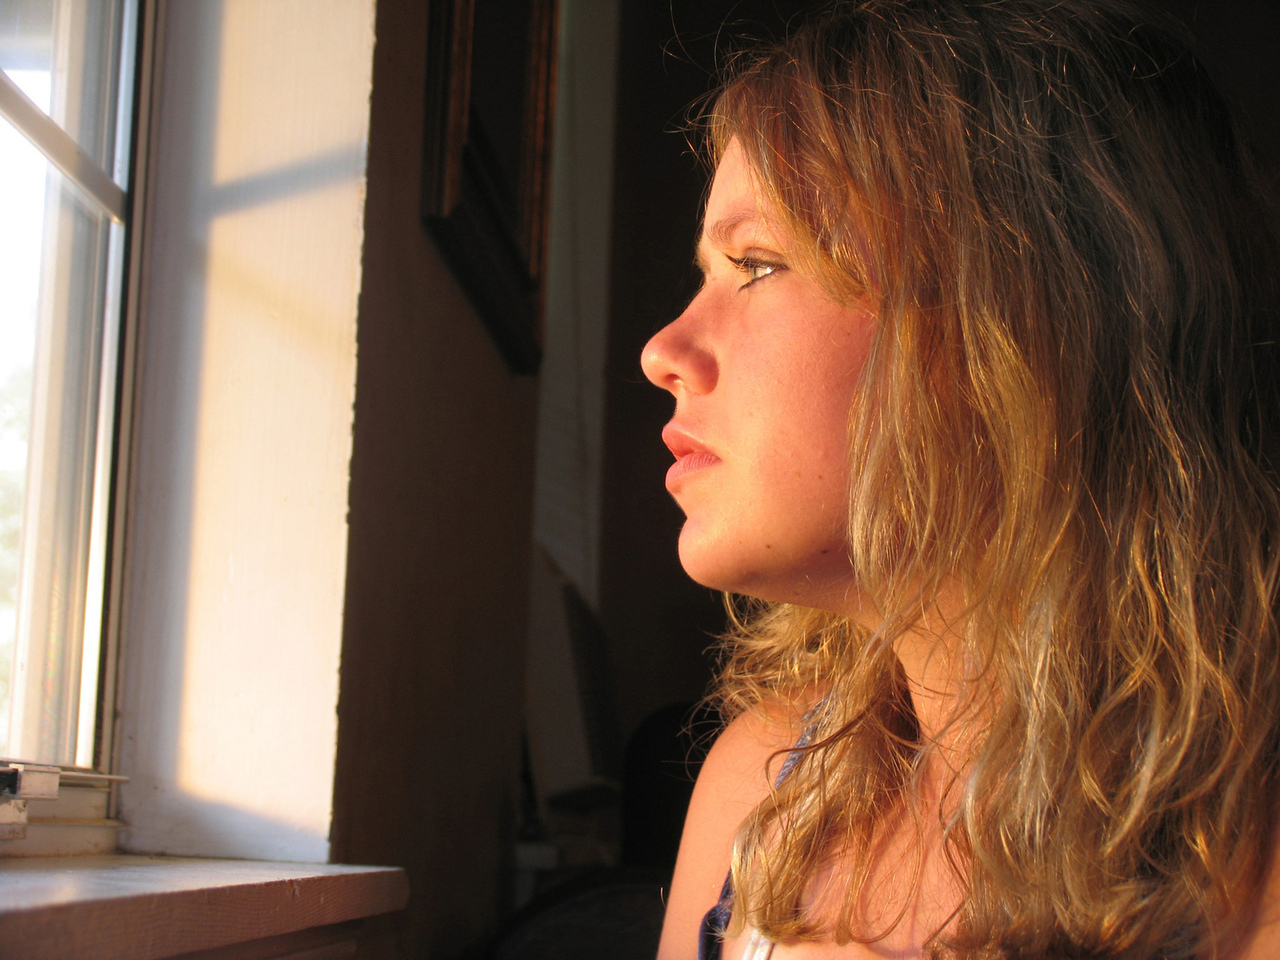 in-the-window-1504767-1280x960